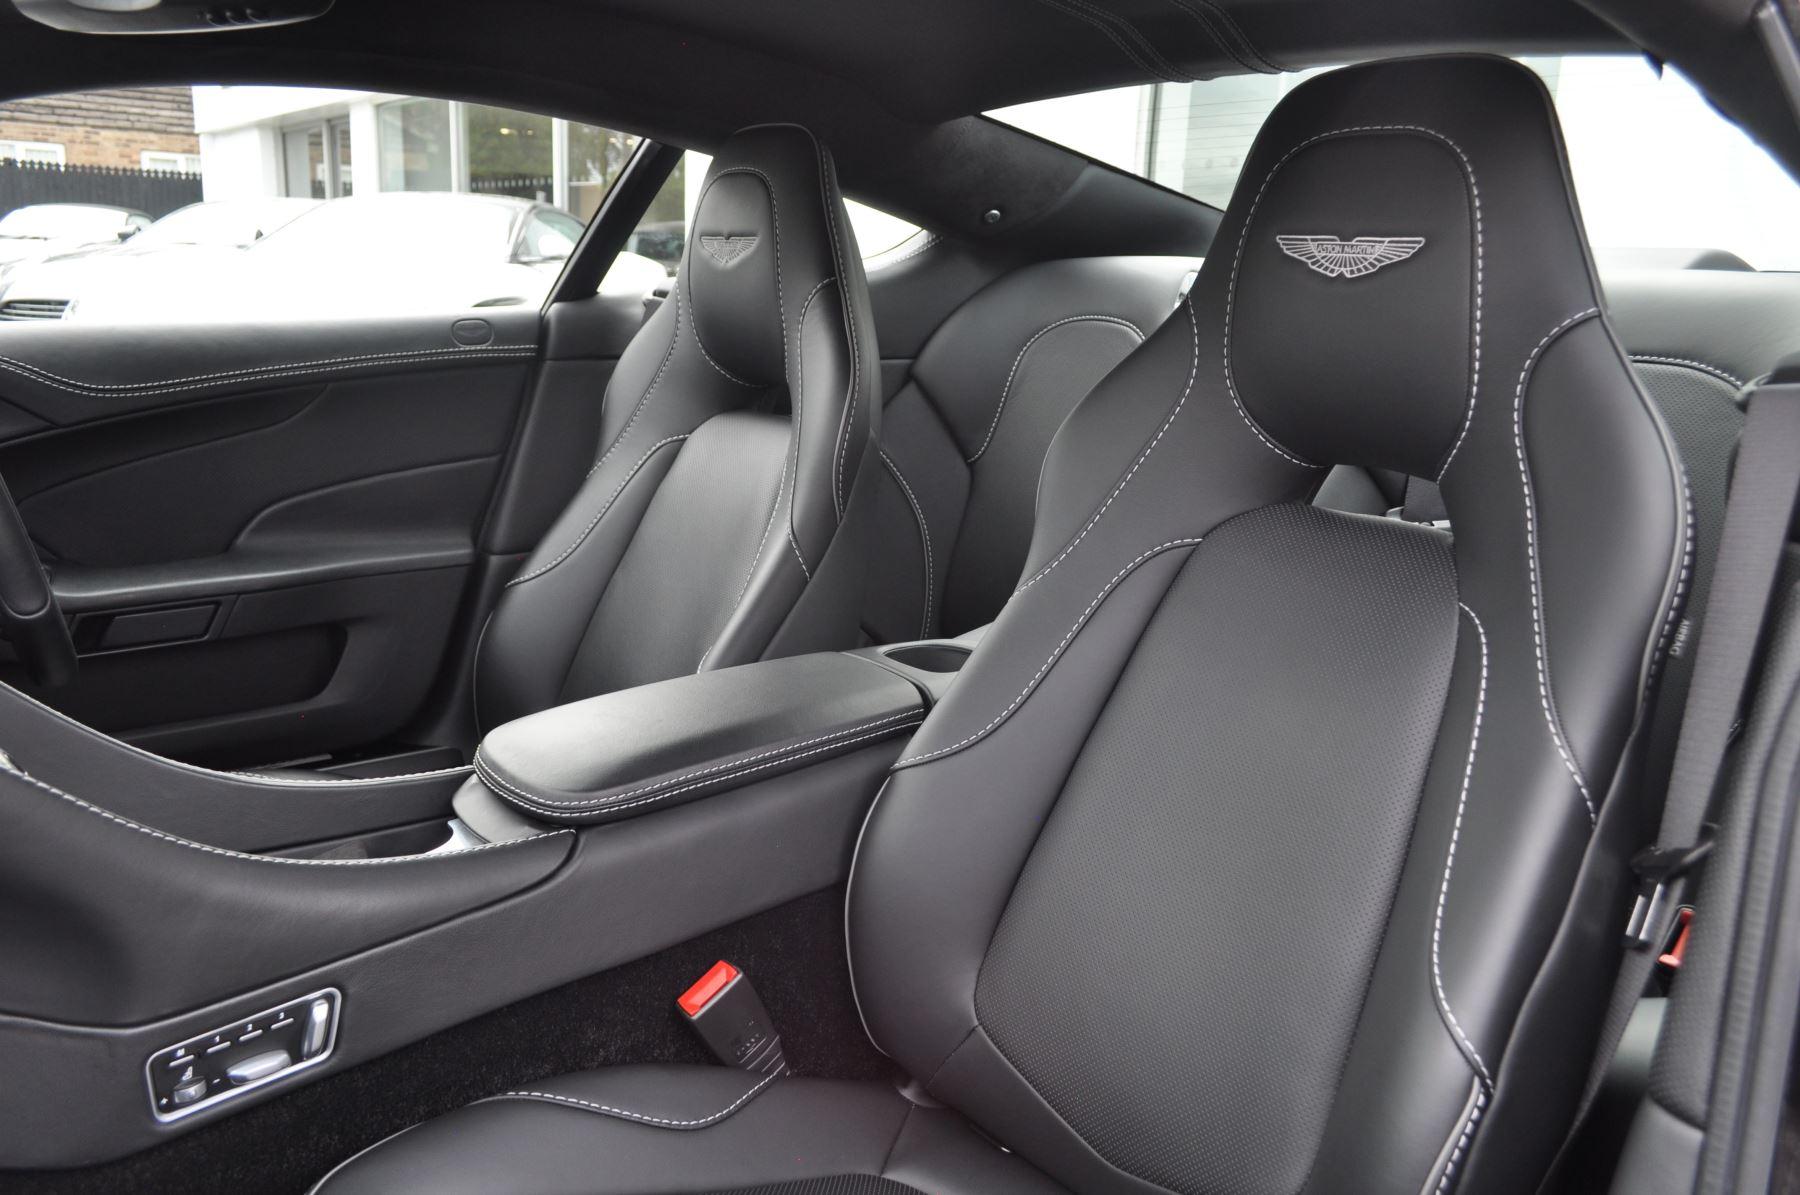 Aston Martin Vanquish V12 [568] 2+2 2dr Touchtronic image 23